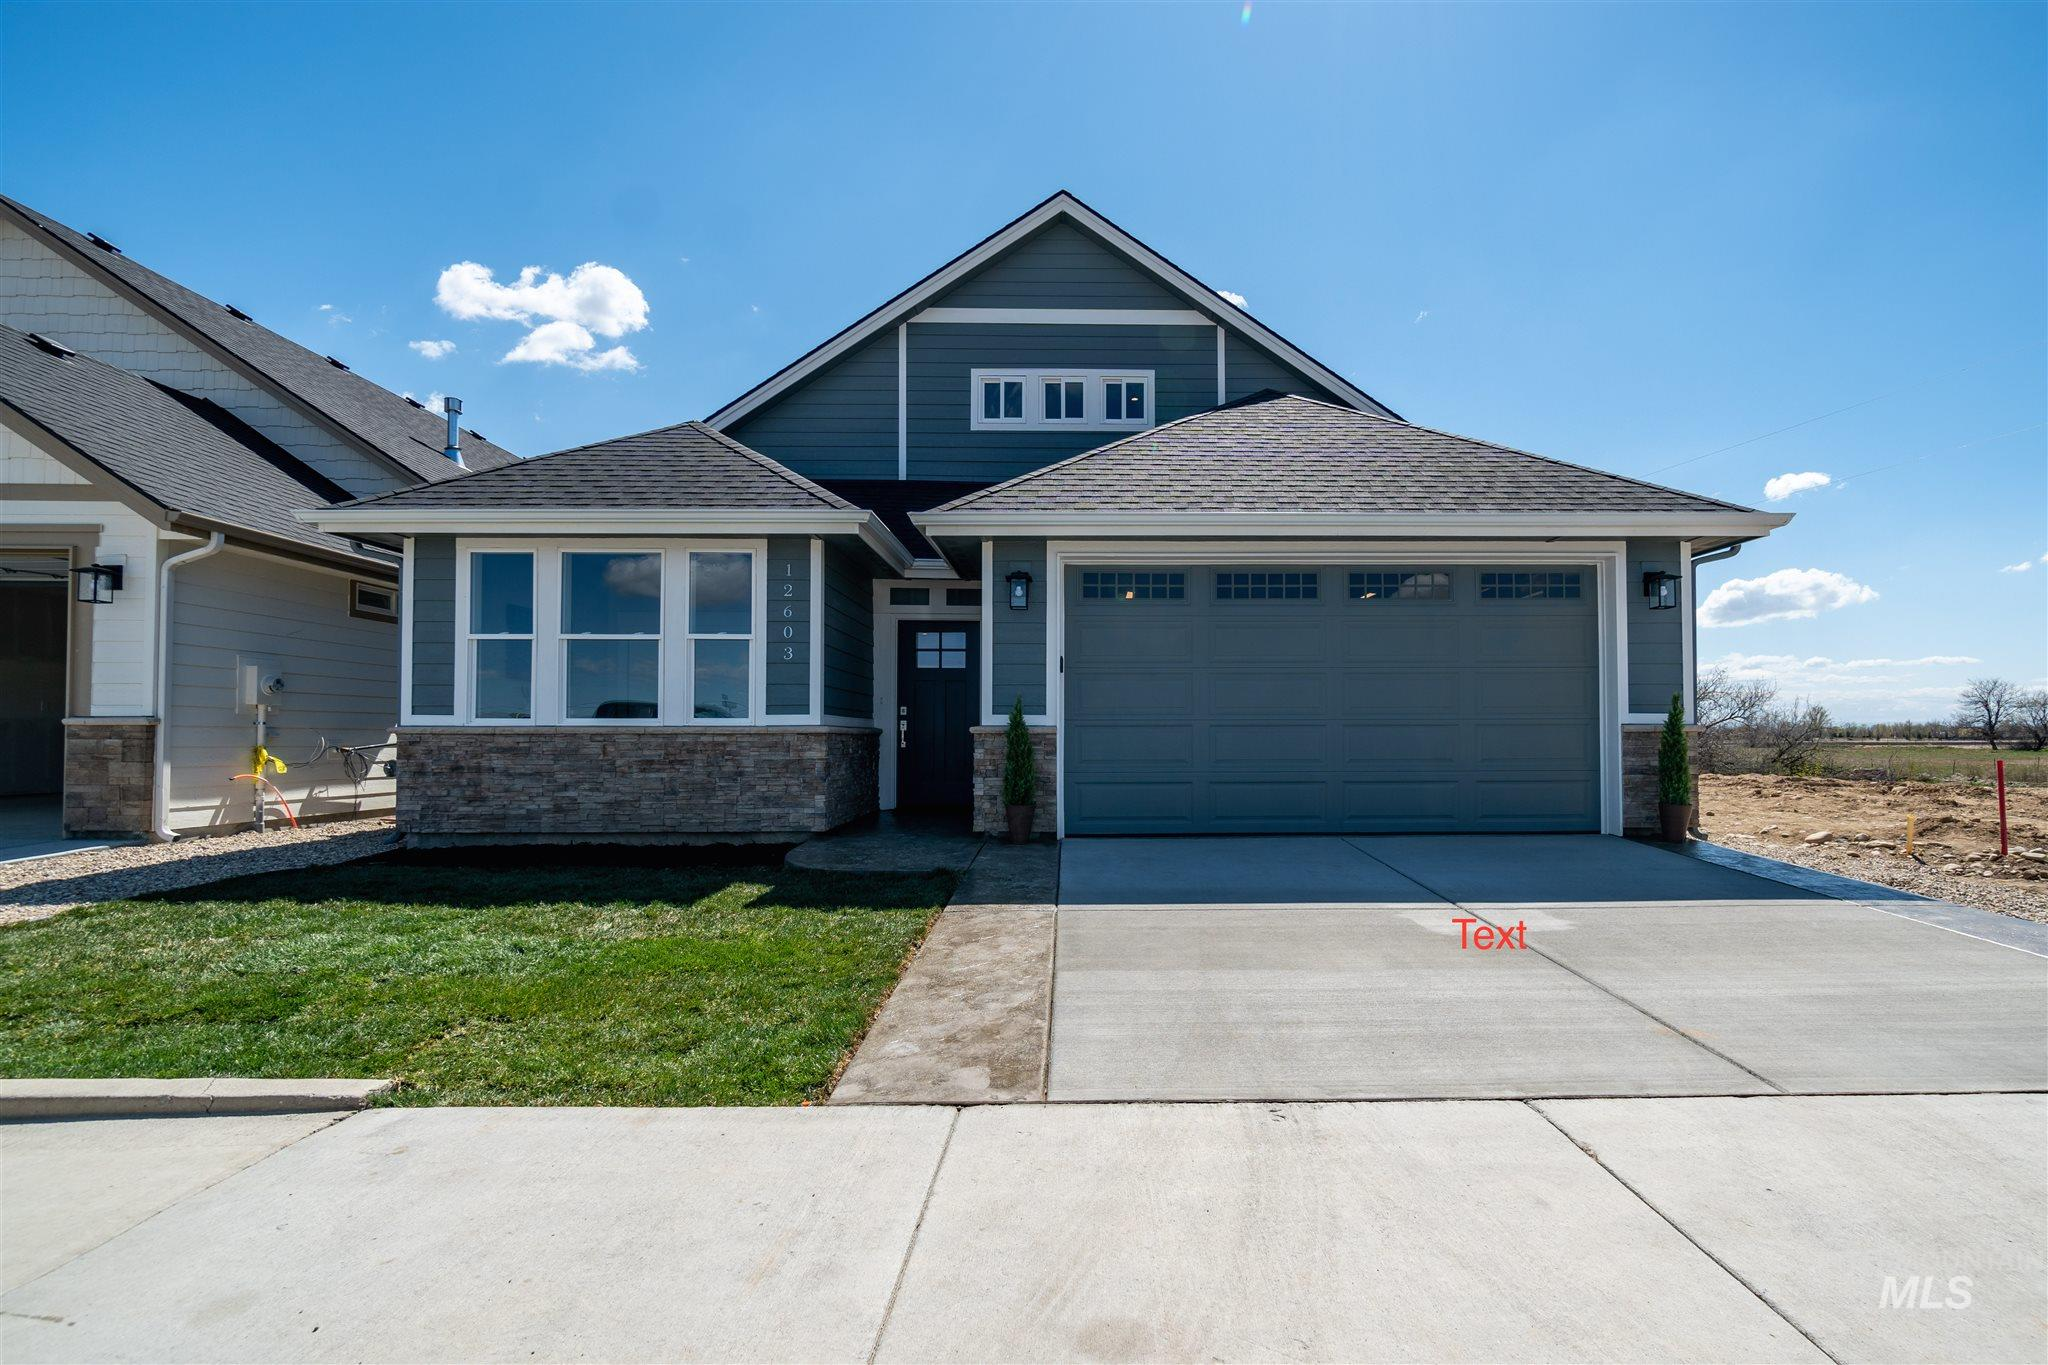 12579 W Nabesna St Property Photo - Star, ID real estate listing